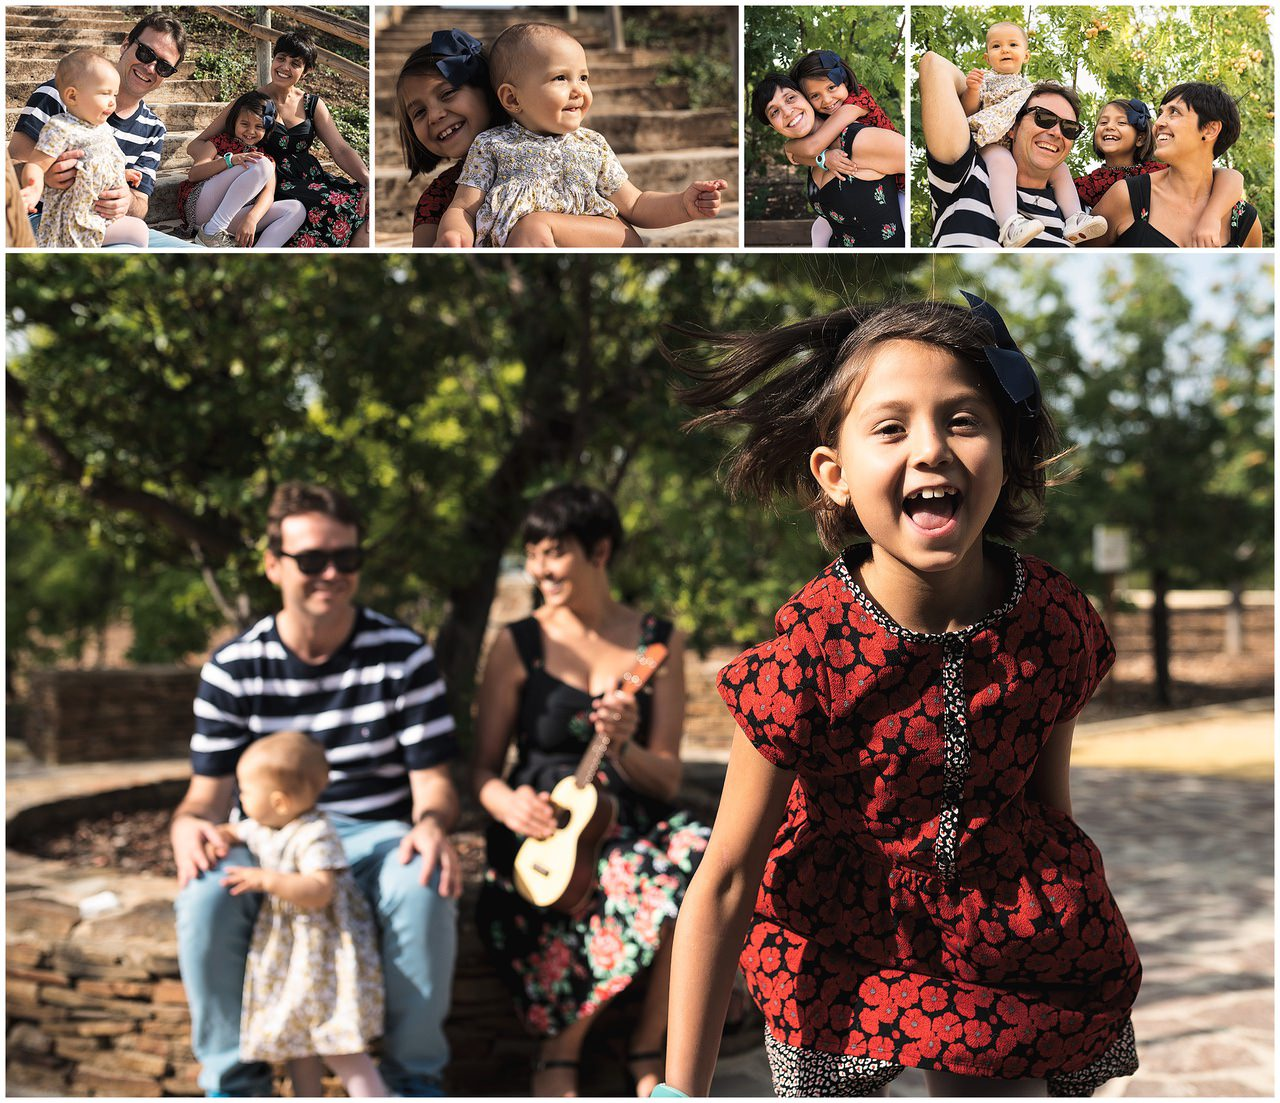 fotografo de bodas en alcoy, fotos familia onil5